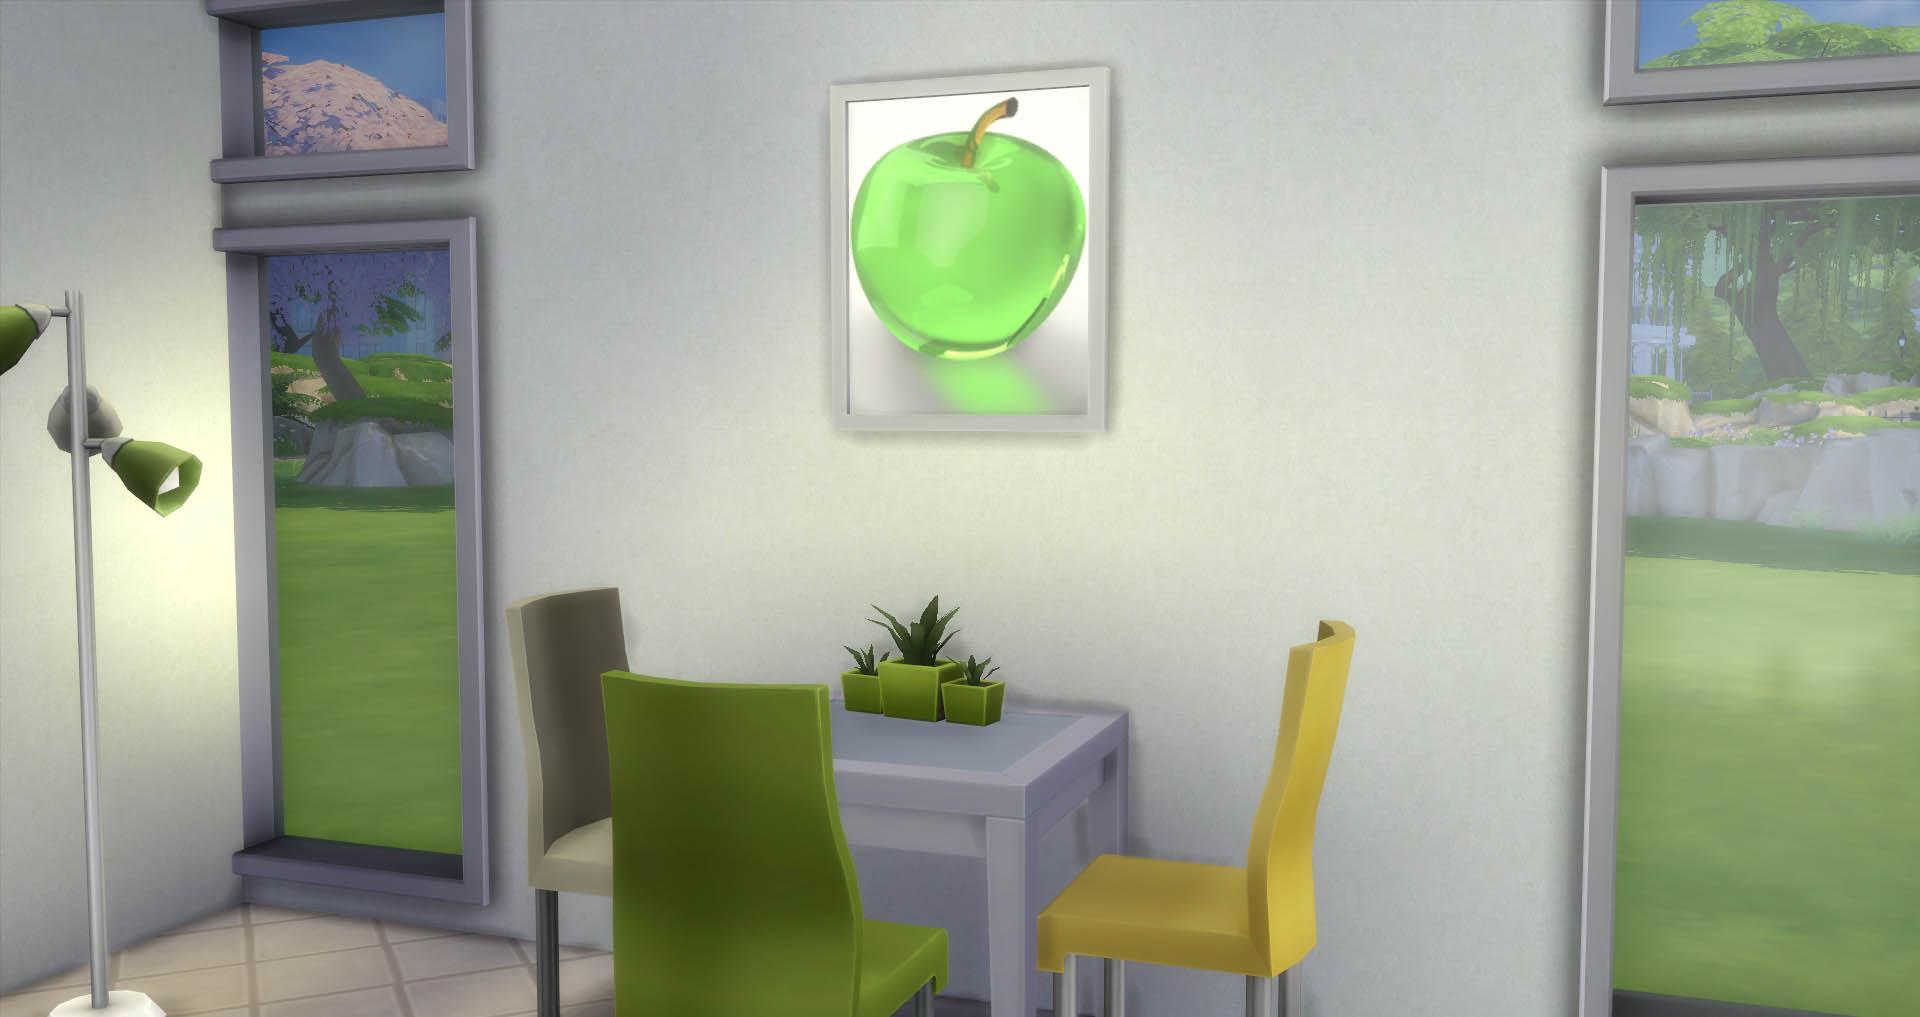 Frutas de cristal descargas capital sims - Frutas de cristal ...